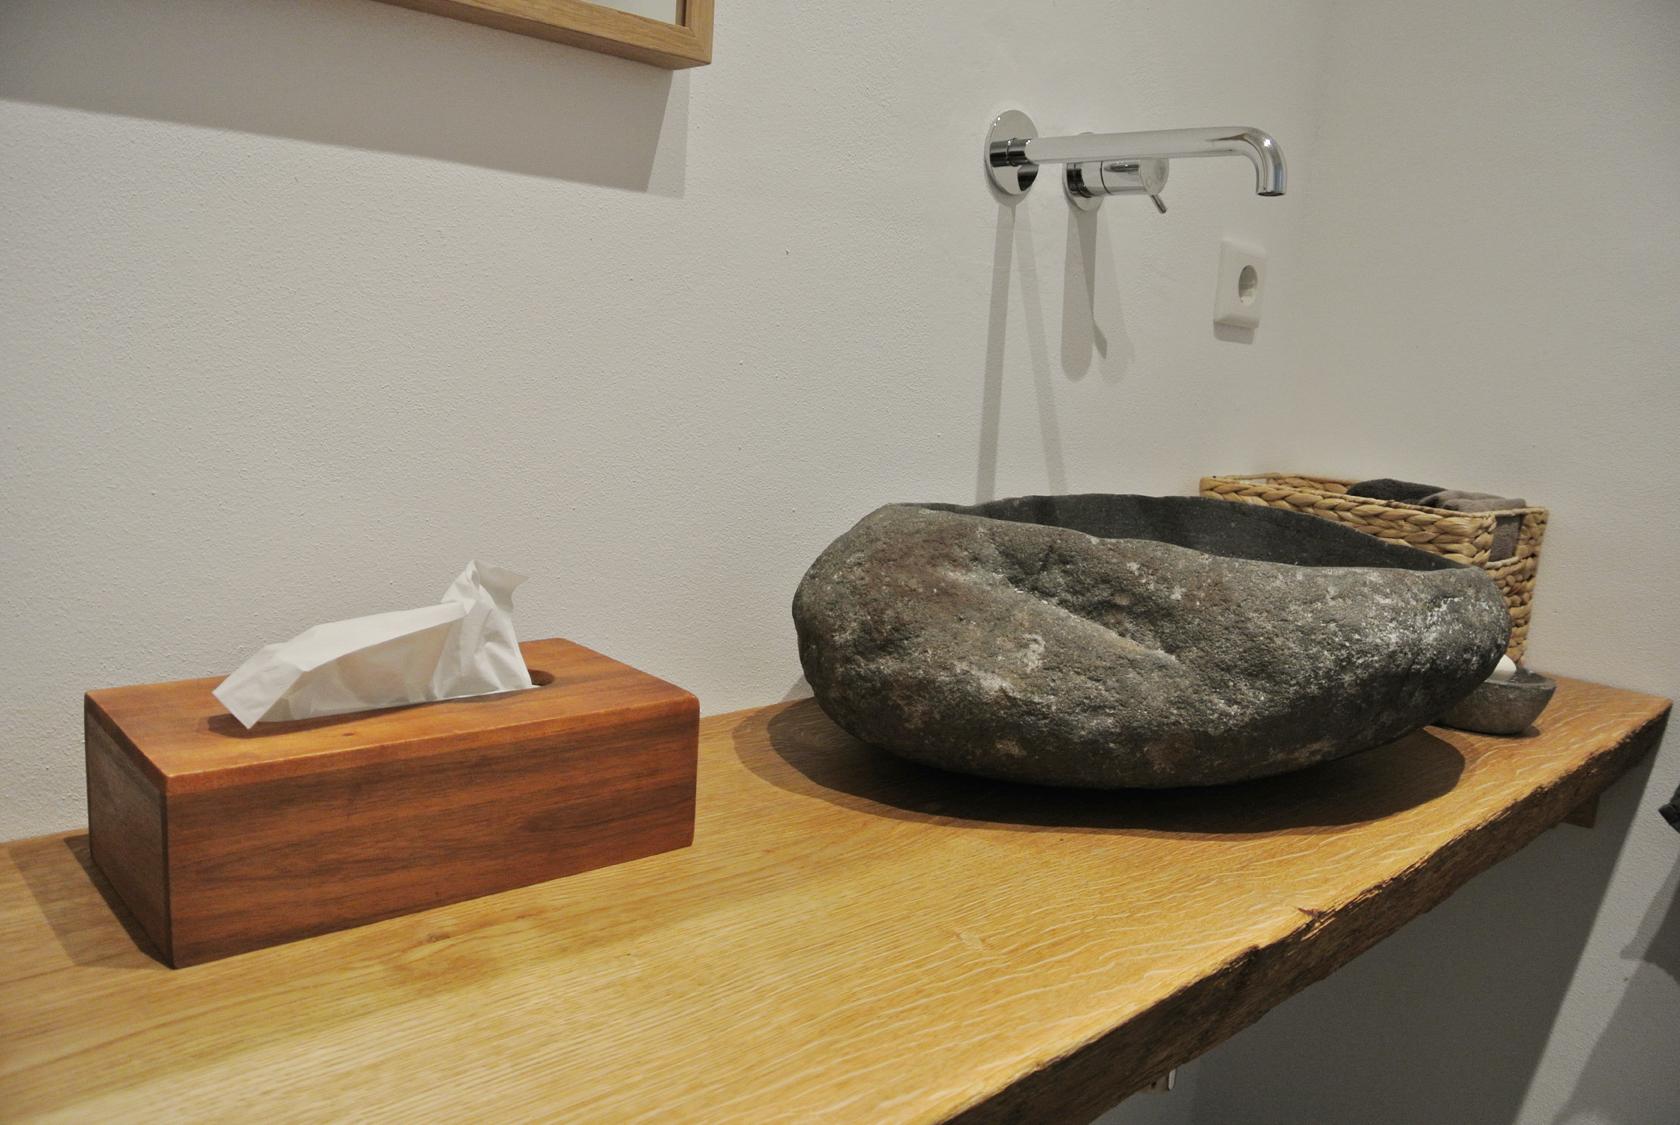 Waschtisch rustikal - Badezimmermobel rustikal ...